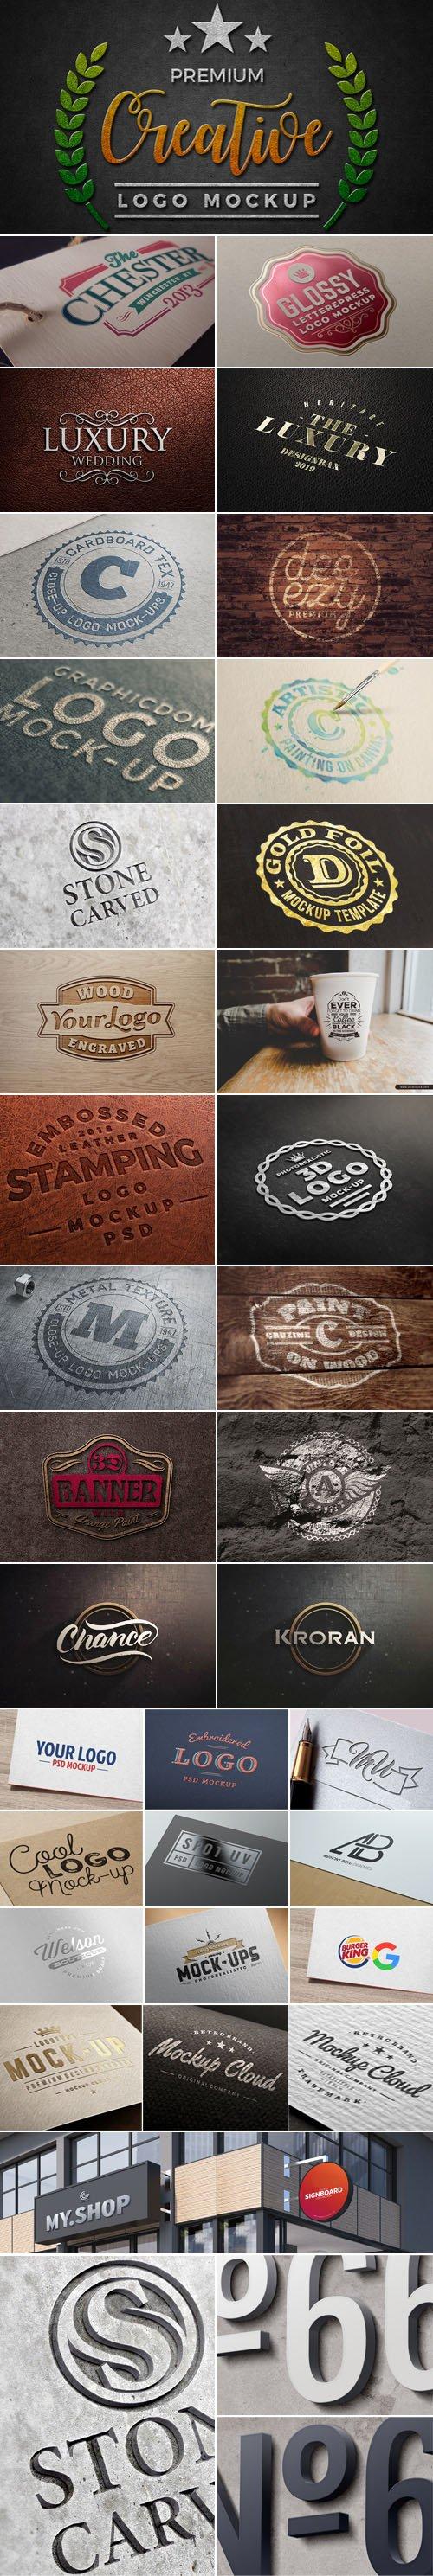 33 High Quality Logo PSD Mockups Collection